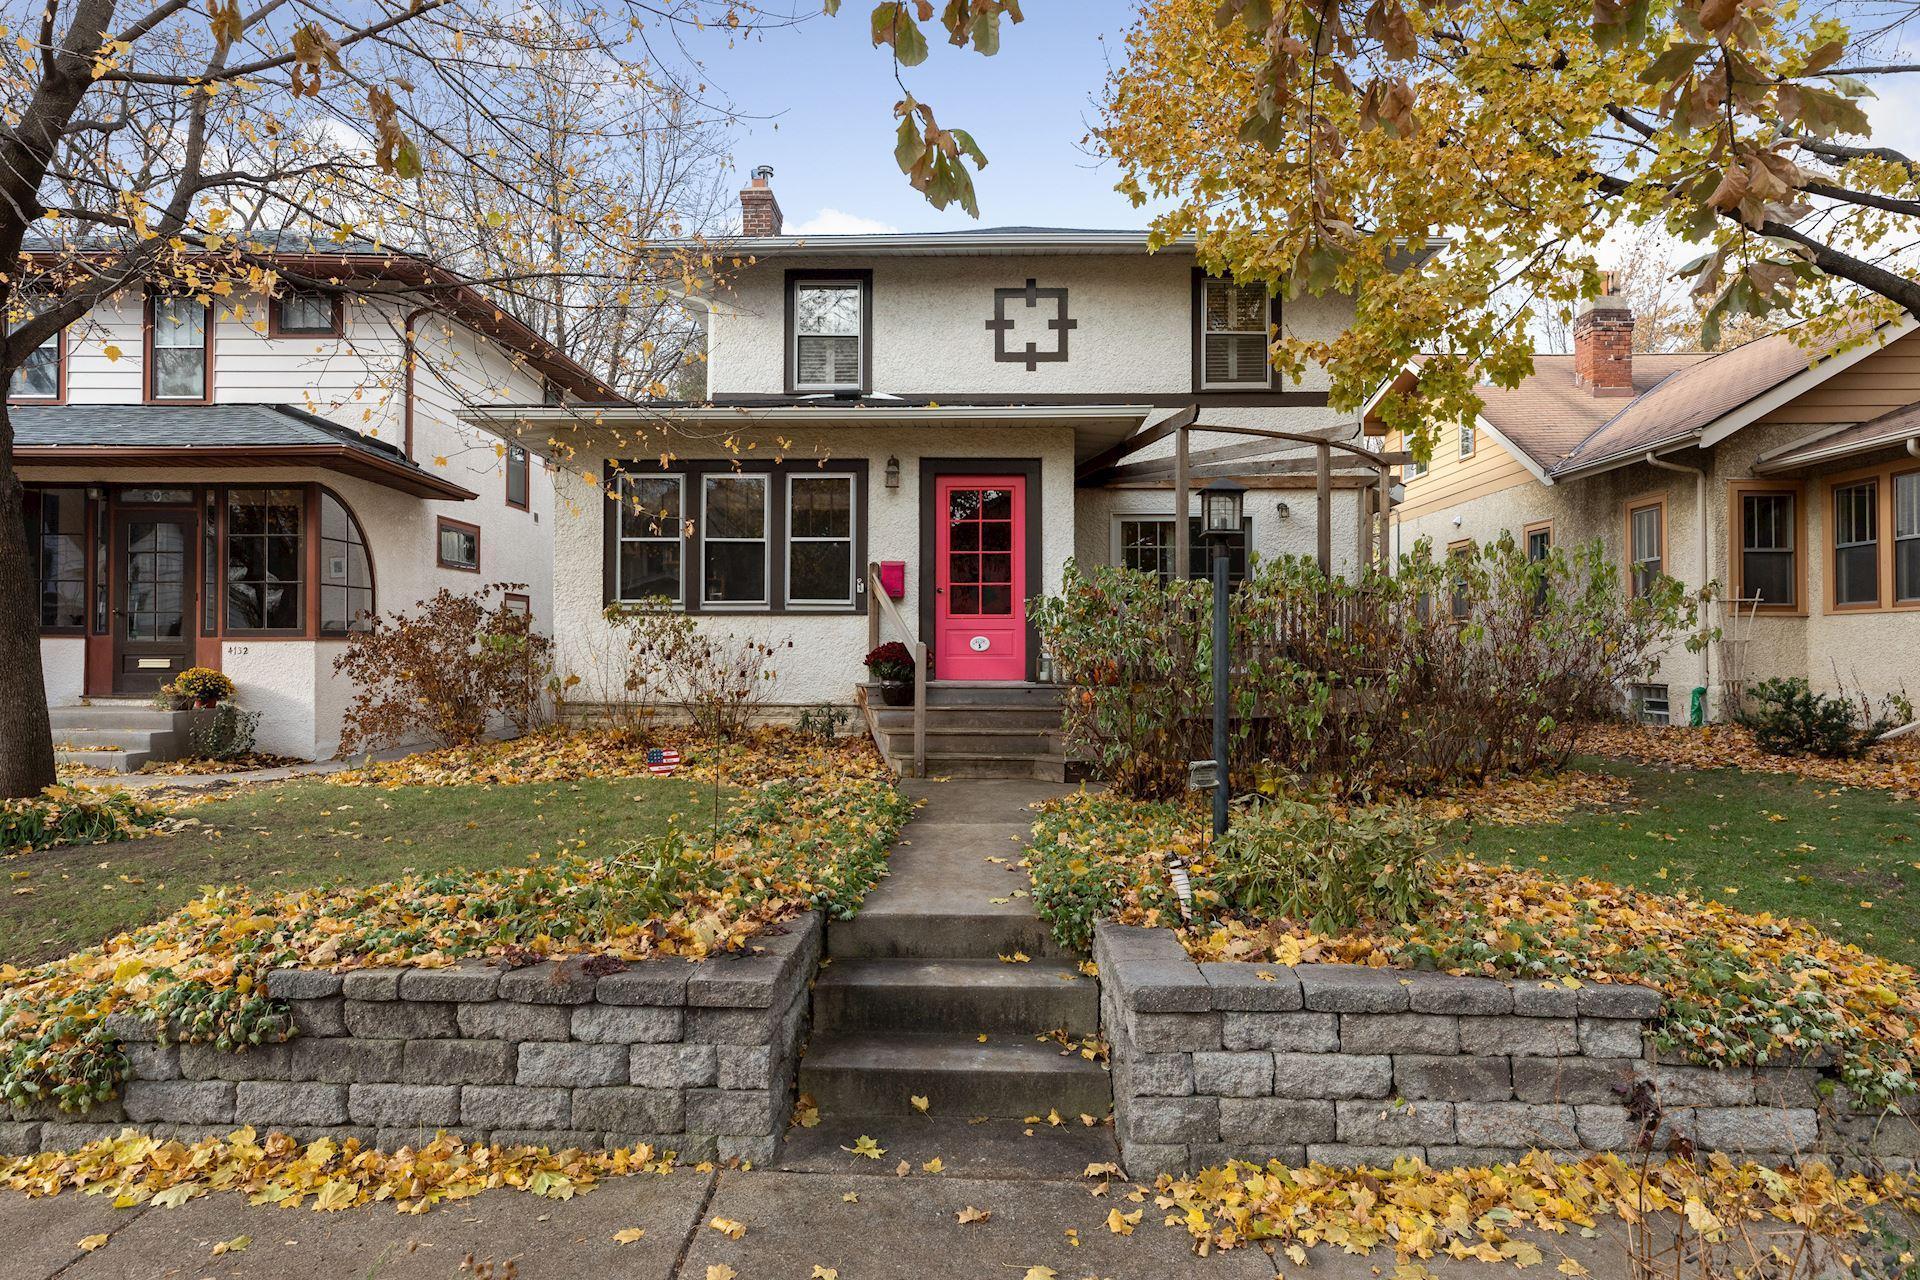 4128 Harriet Property Photo - Minneapolis, MN real estate listing